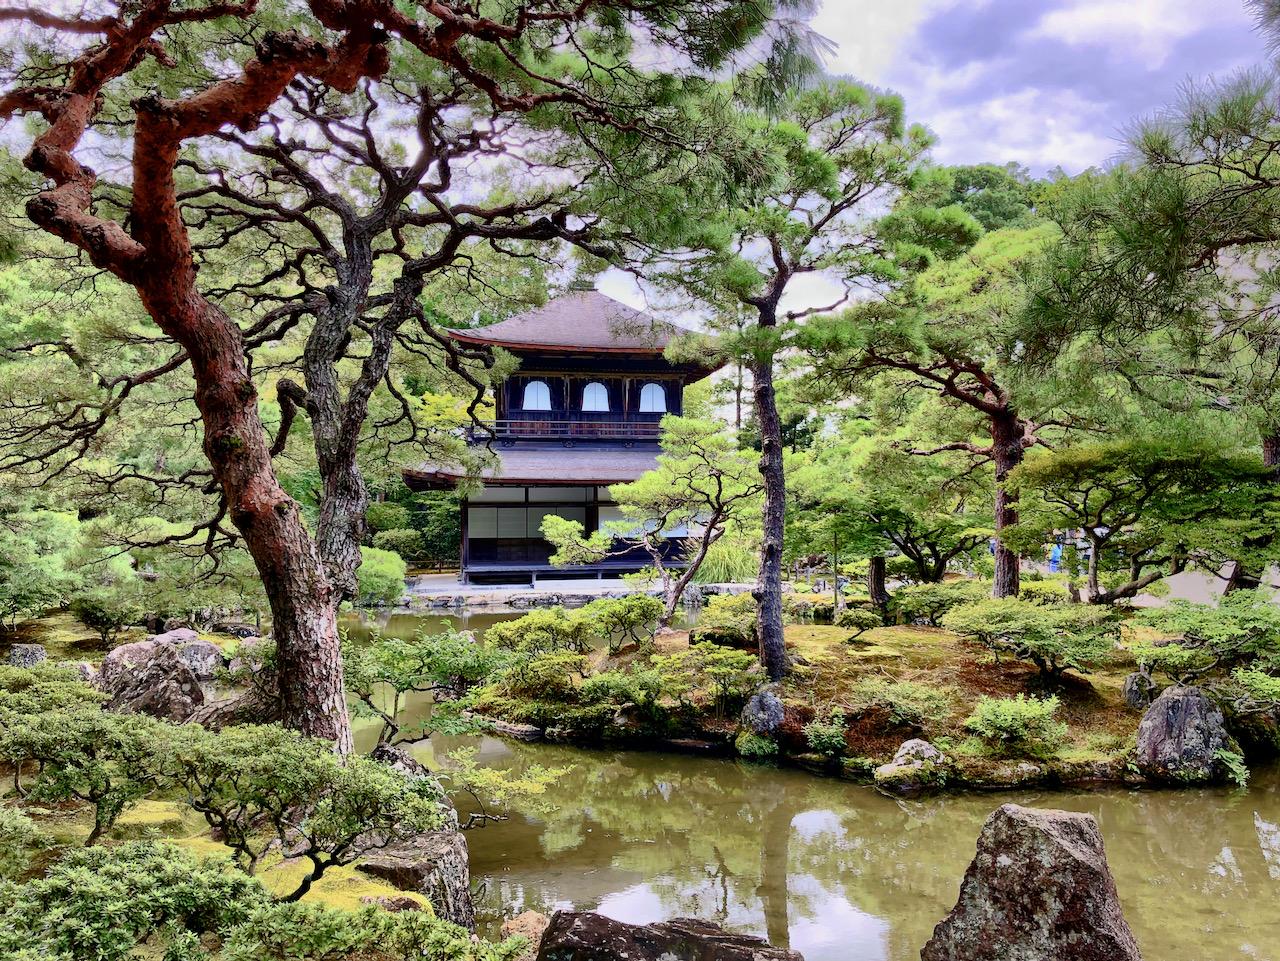 Ginkaku-ji (Silberner Tempel) in Kyōto, Japan (15.09.2019)